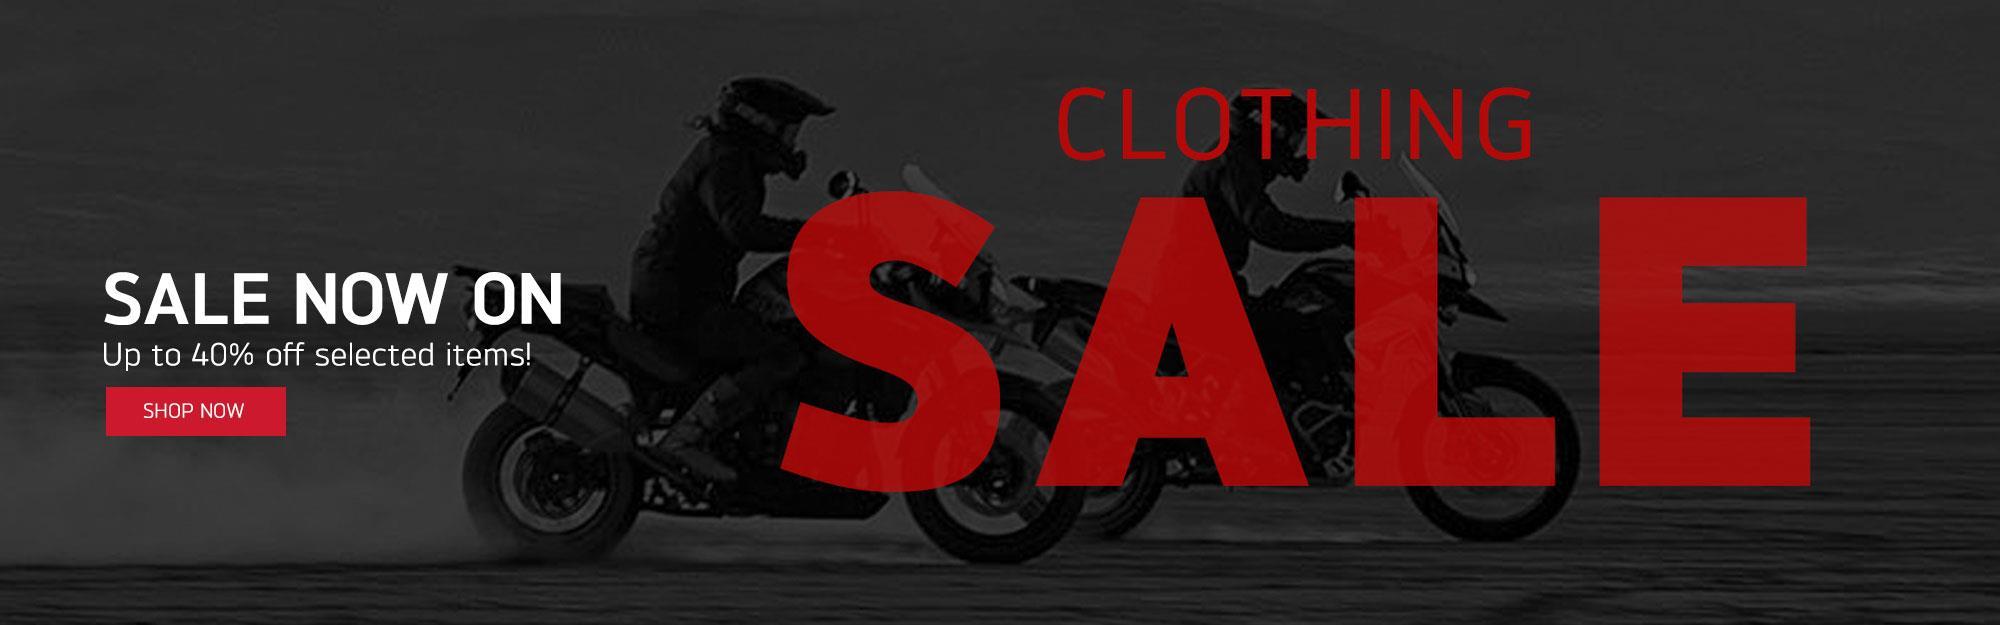 Clothing Sale Hero Banner